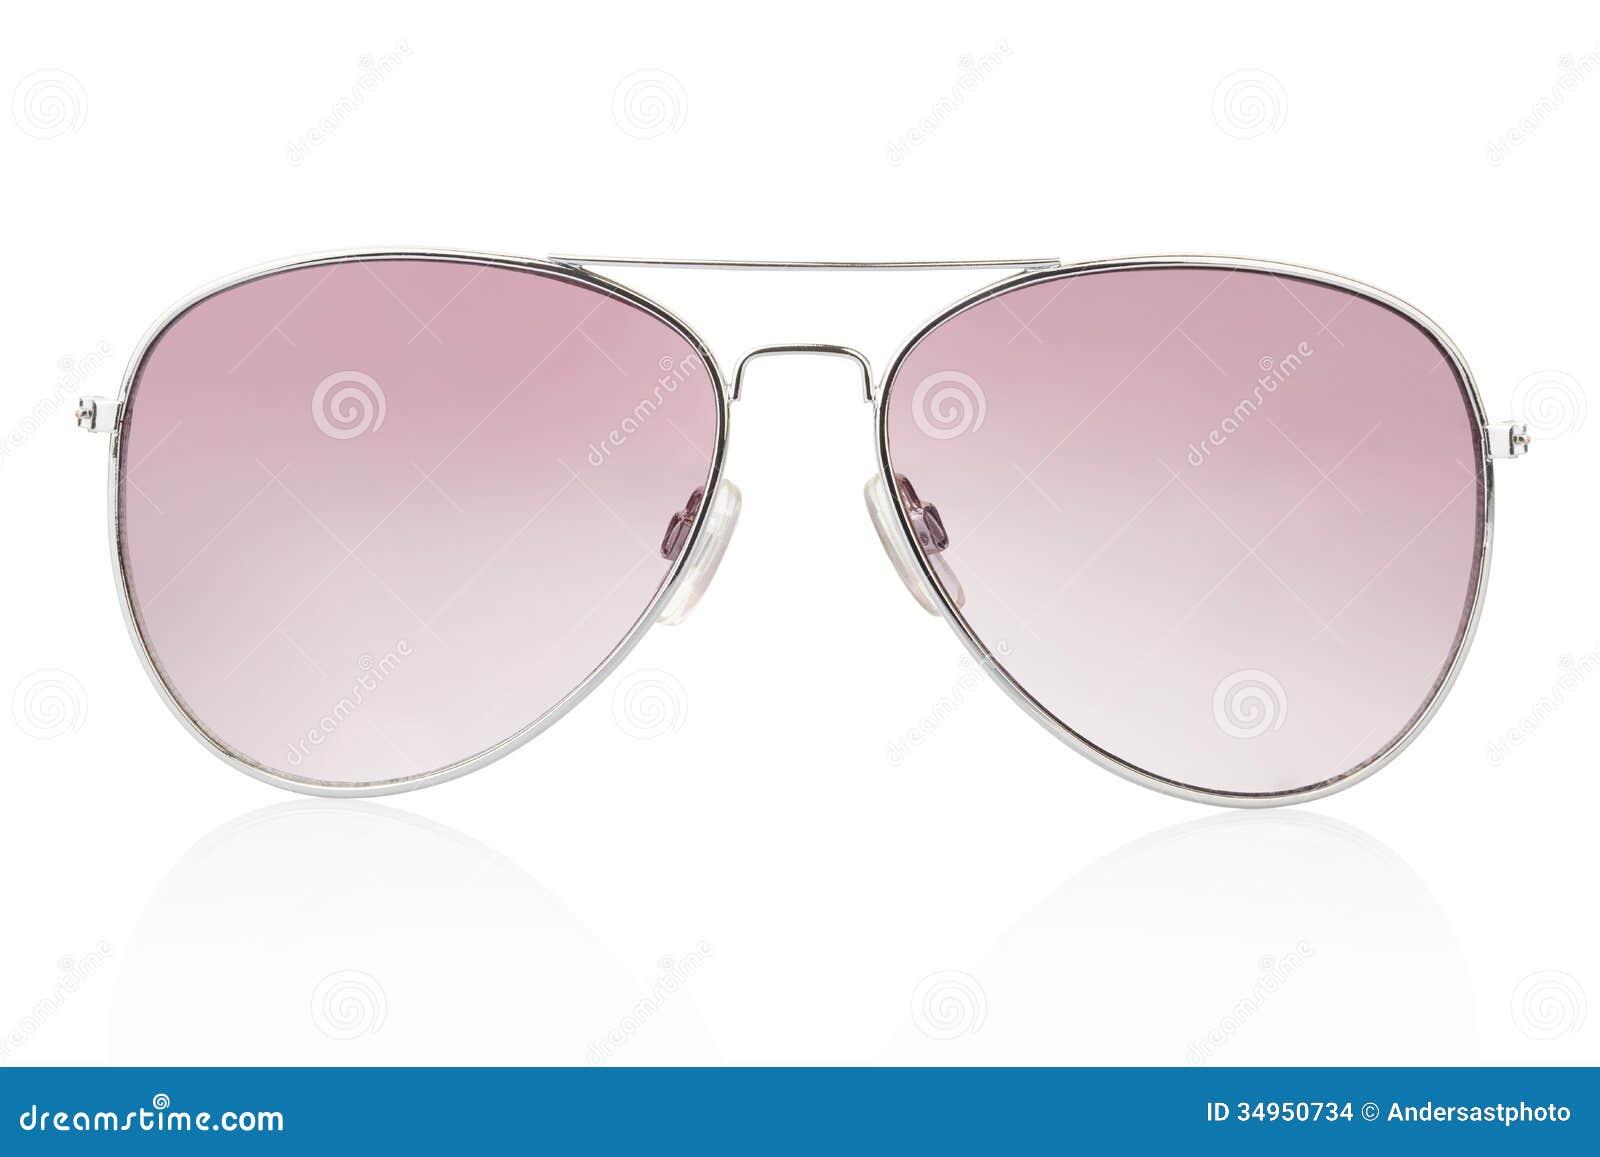 Sunglasses Clipart Black And White Aviator sunglasses1300 x 957